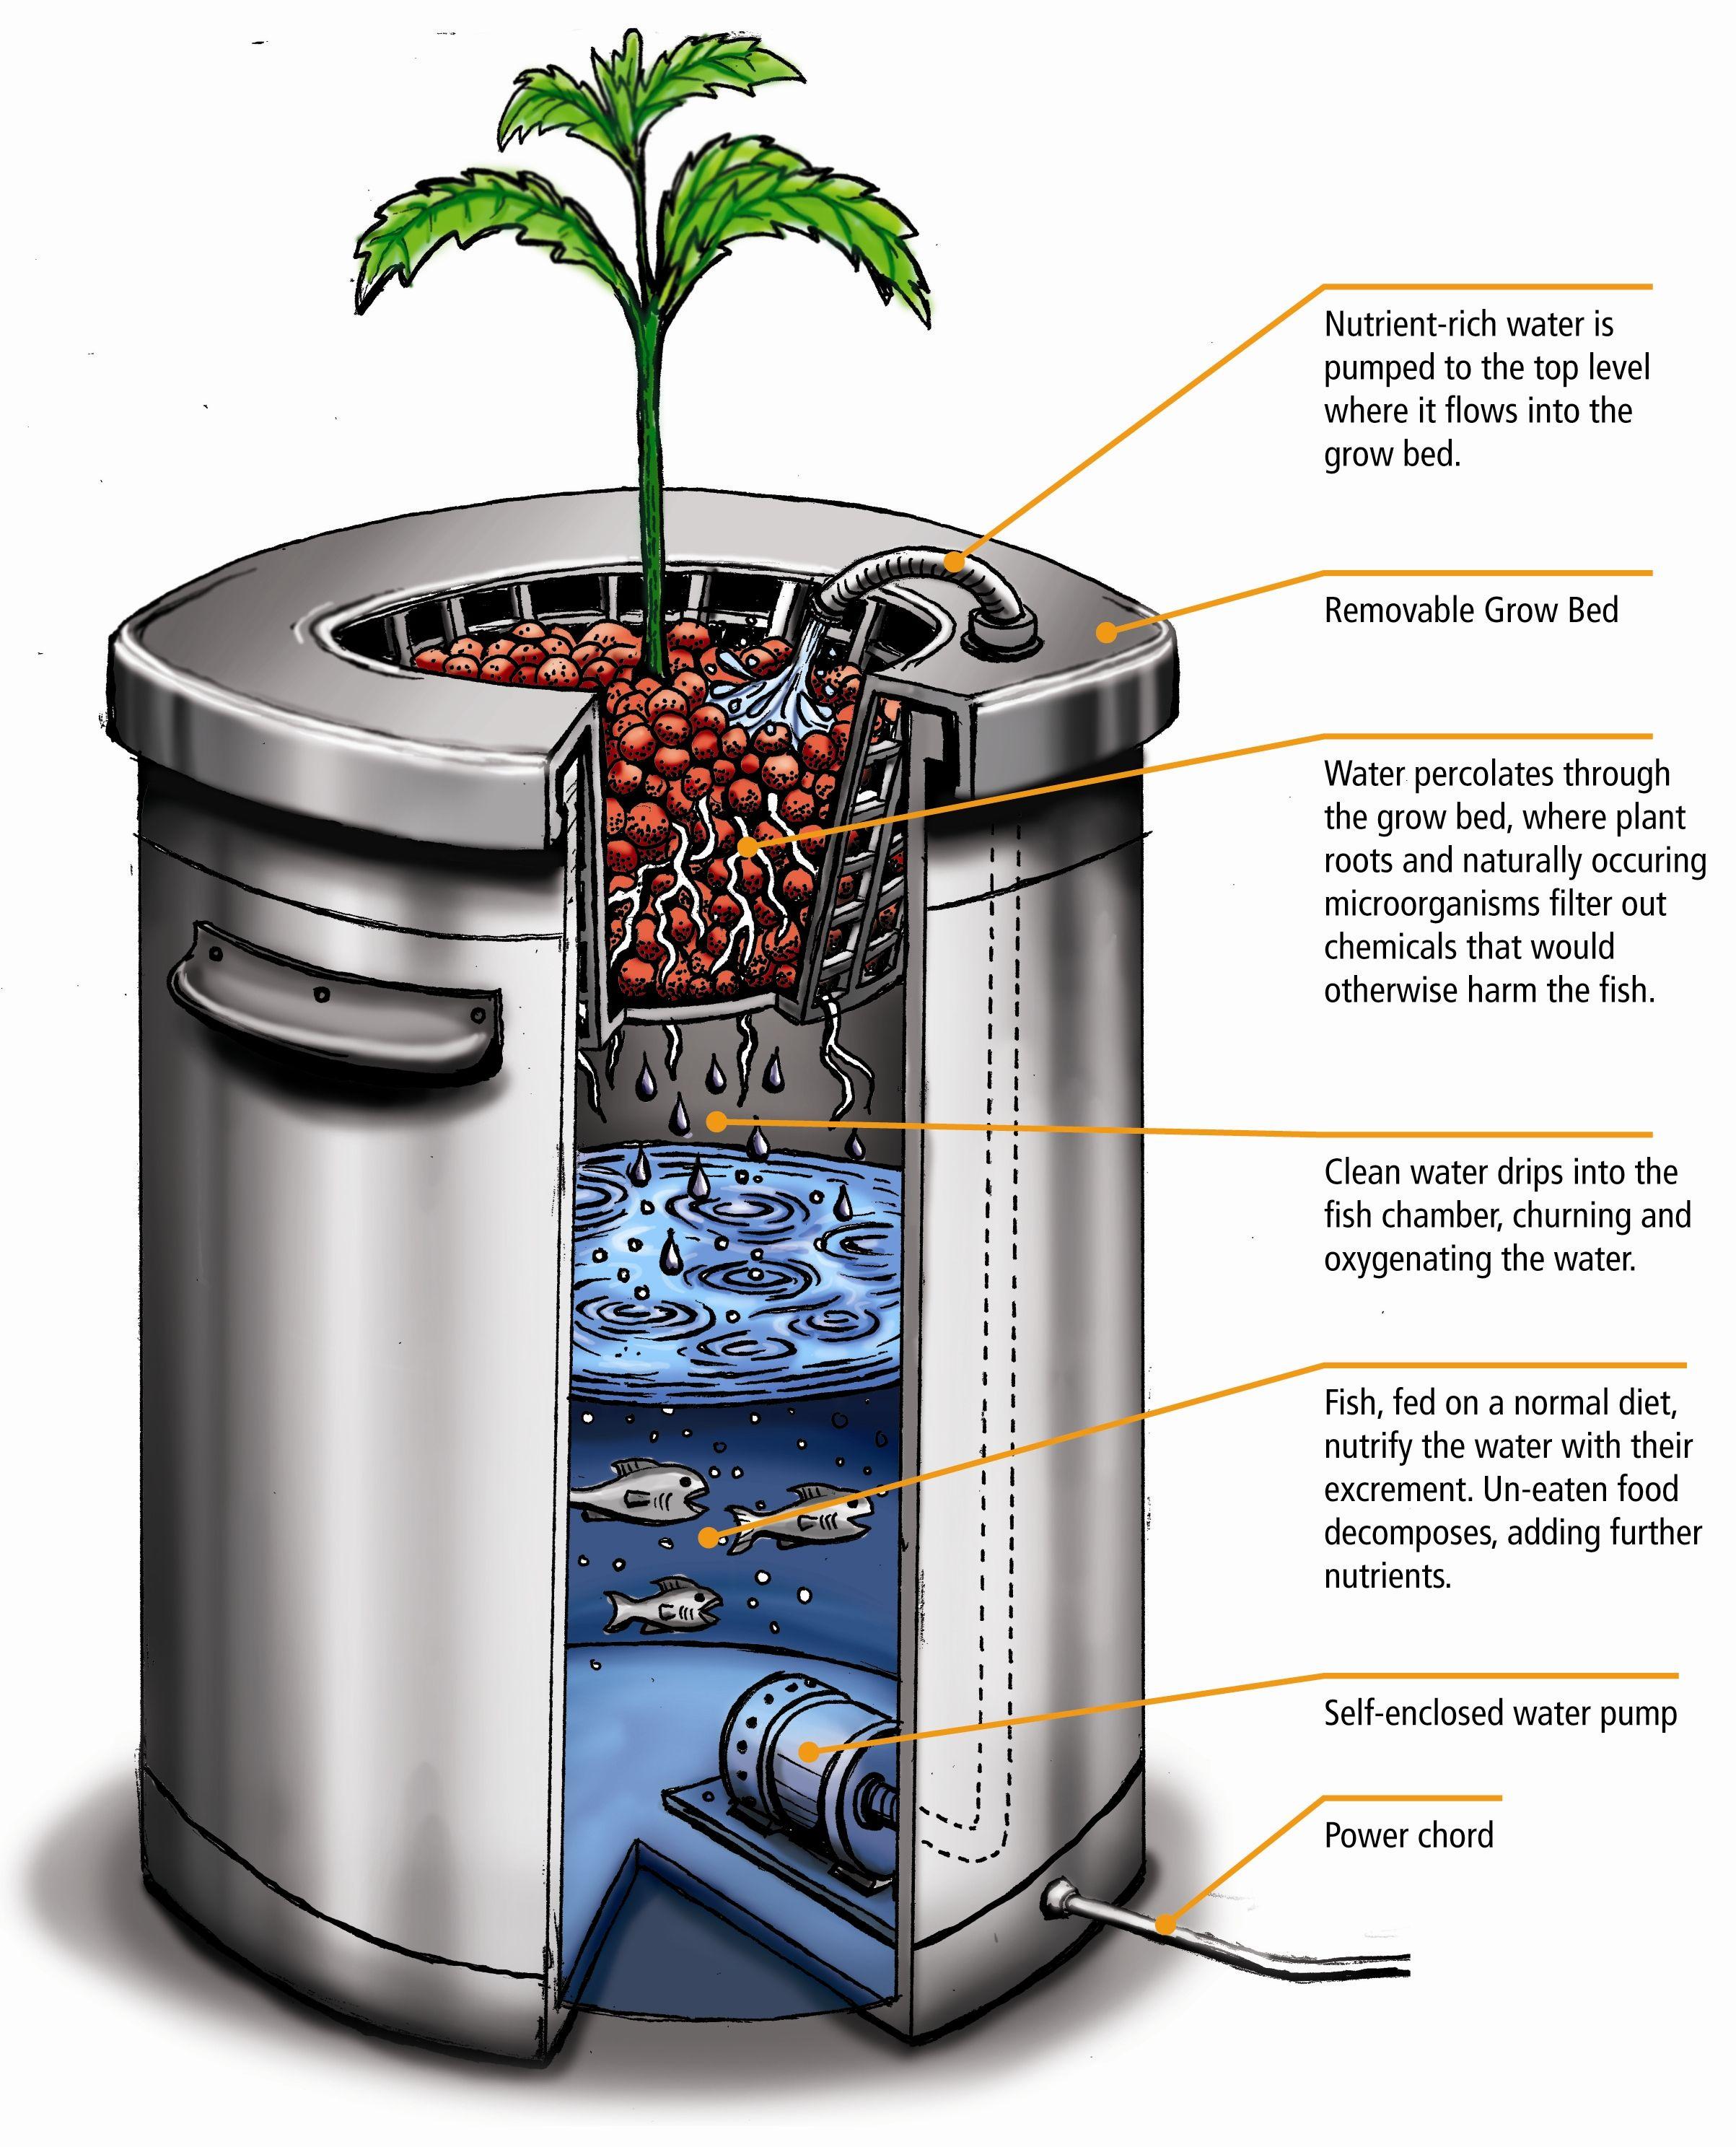 Diy aquaponics hydroponics hydroponics gardens and for Hydroponic fish tank diy